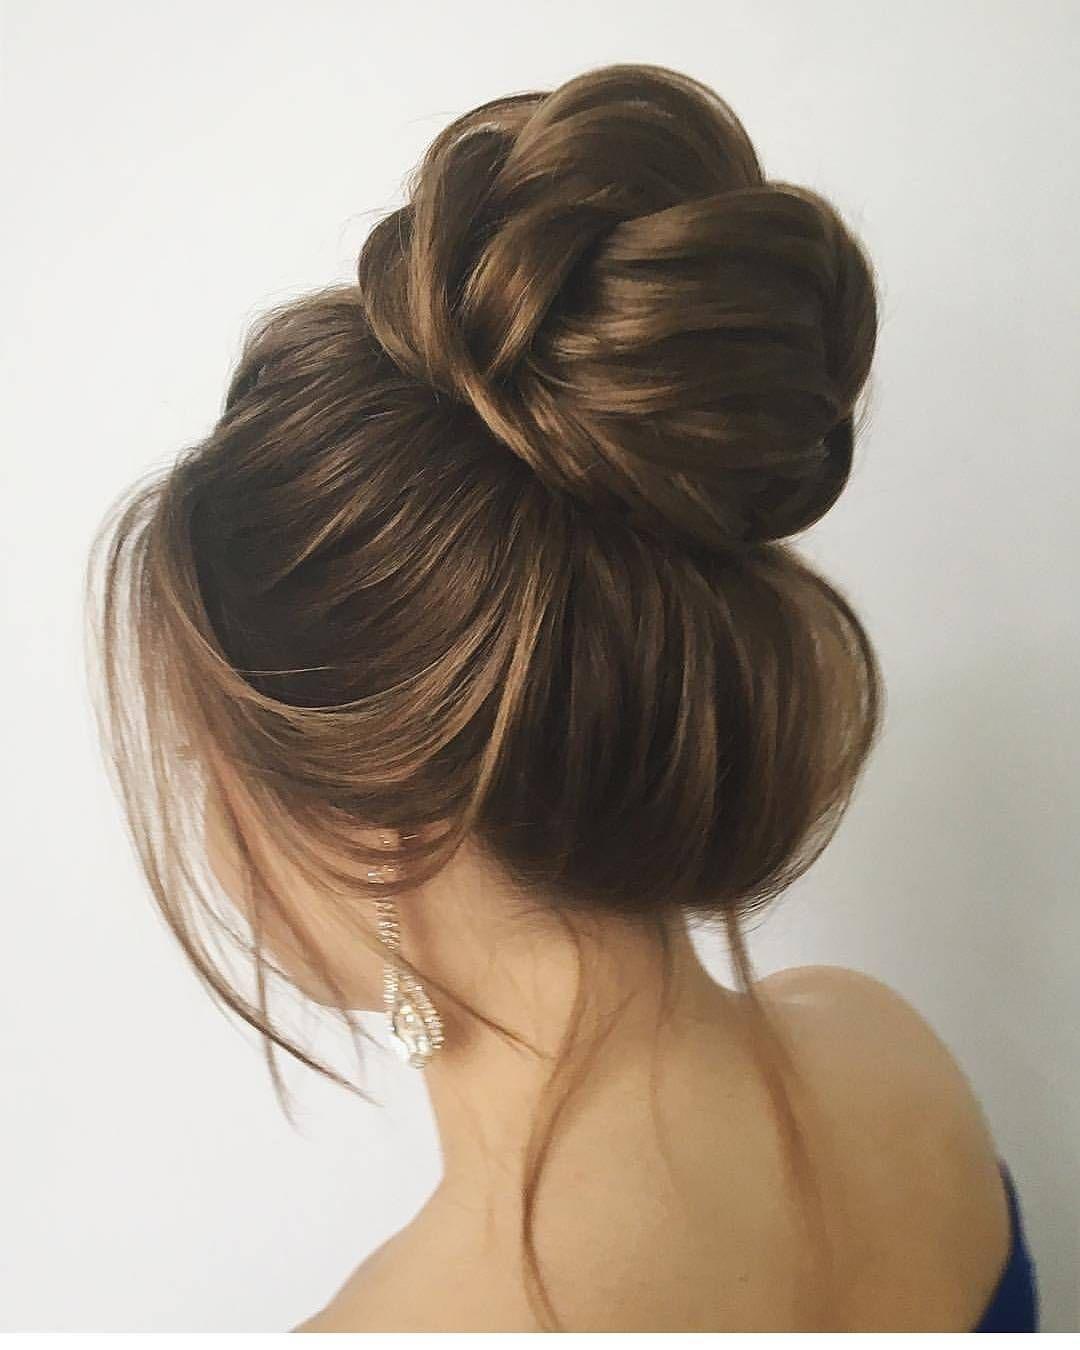 simply pretty bun hairstyle ideas that inspires popular